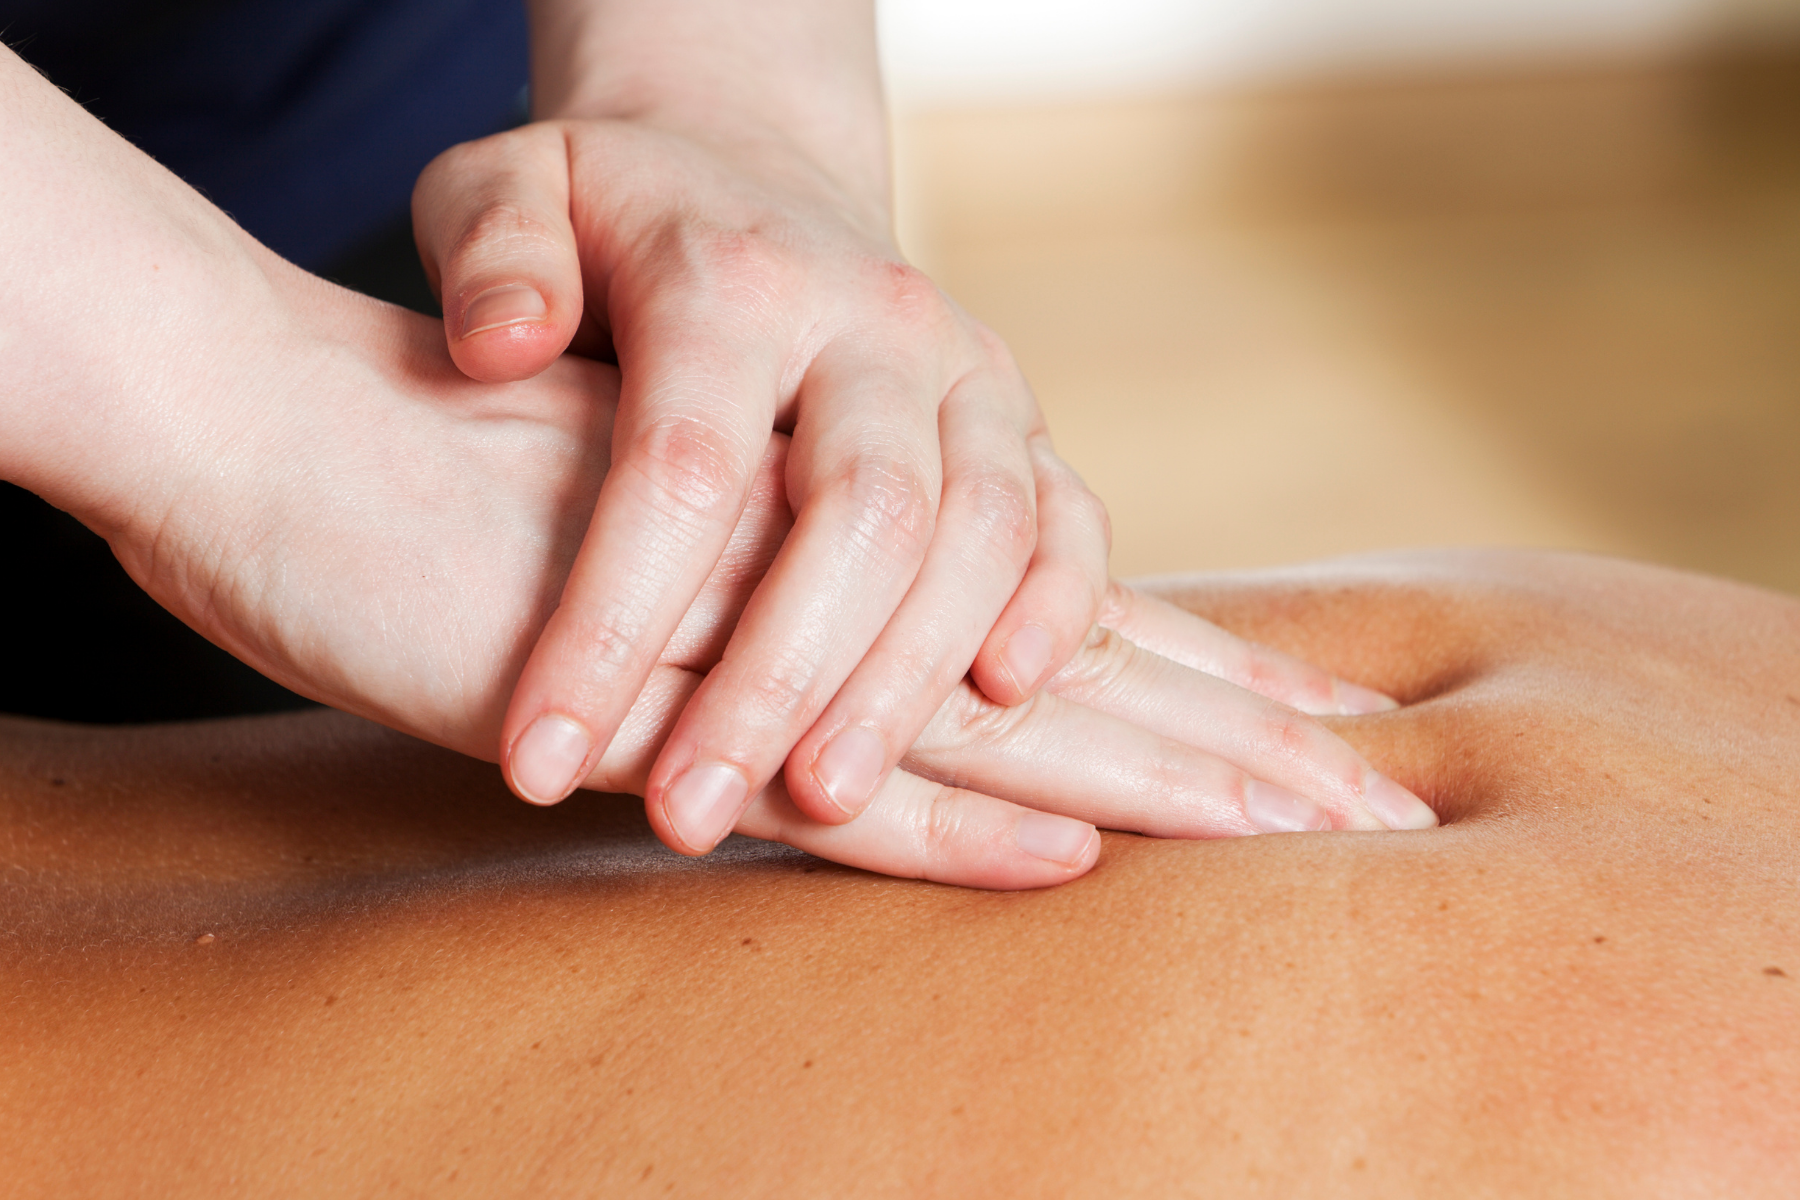 woman giving a back massage